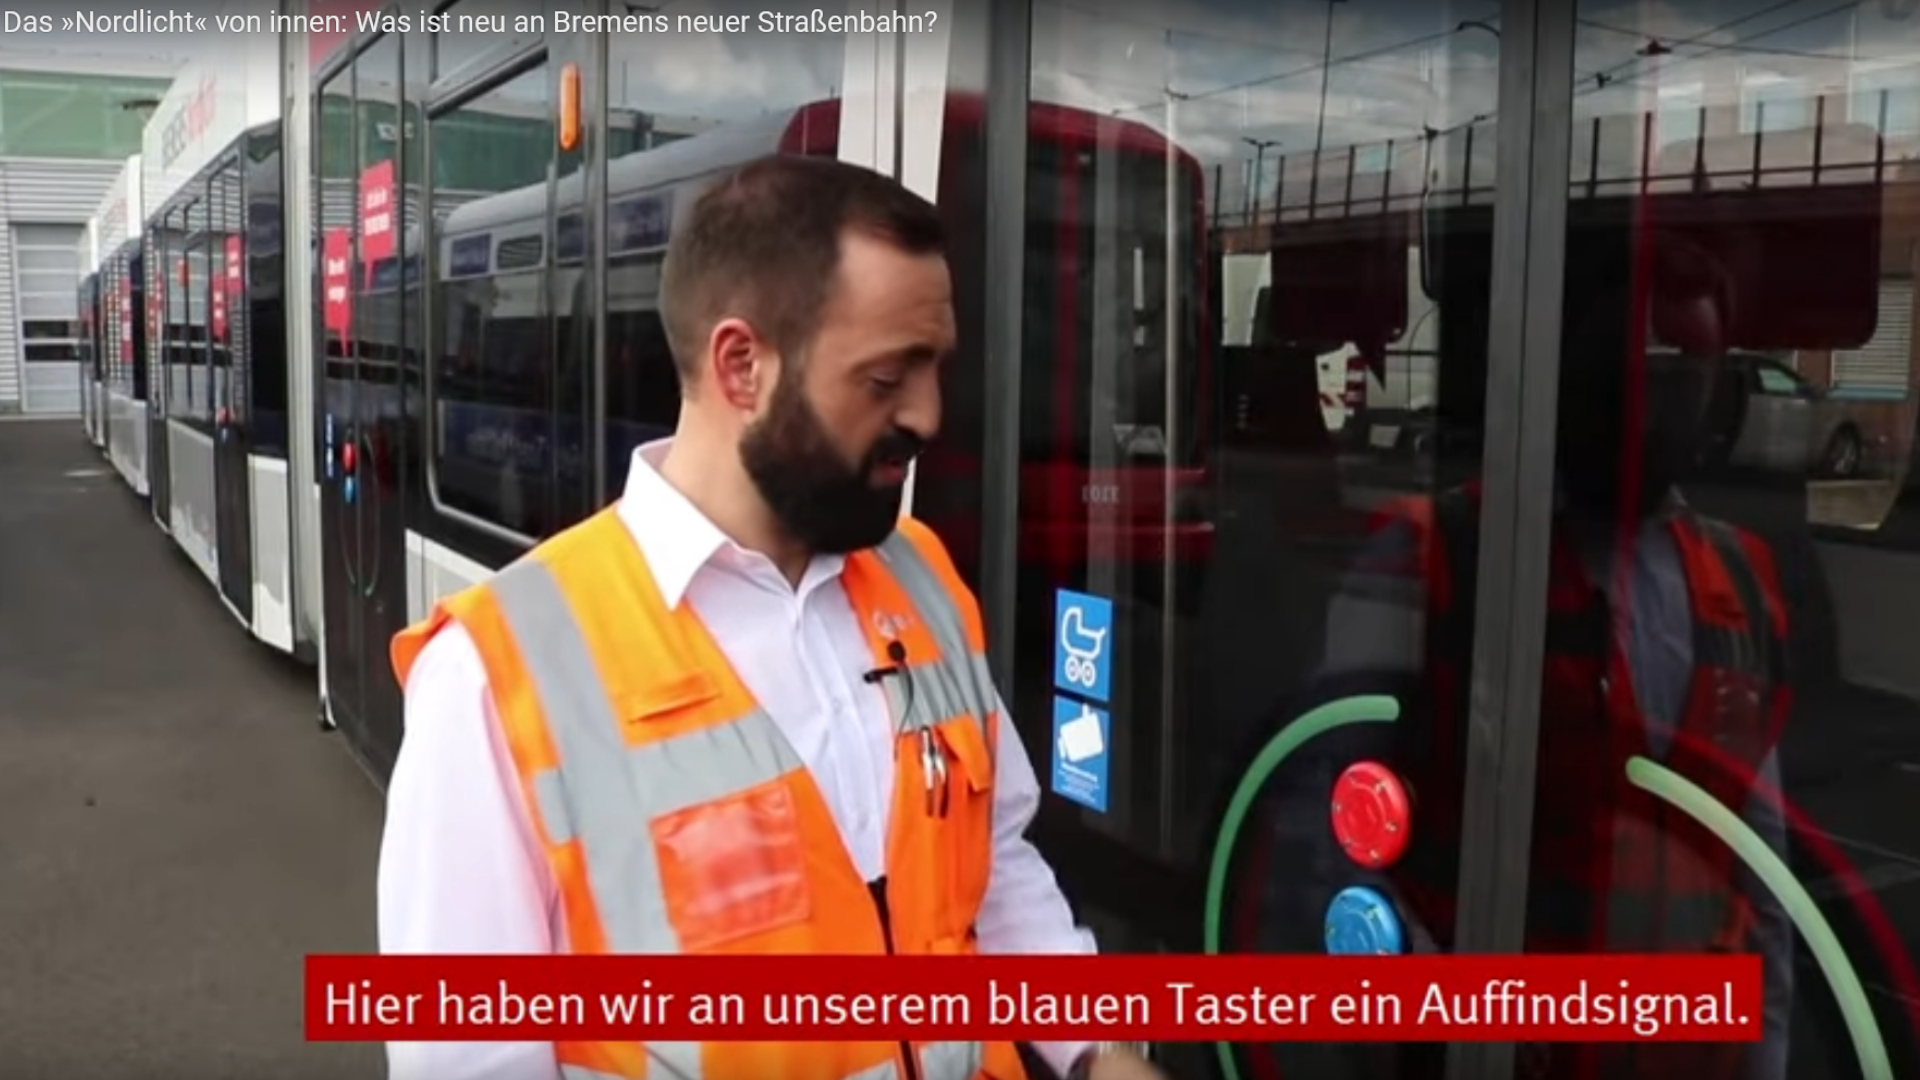 PK52 Taster Strassenbahn Bremen